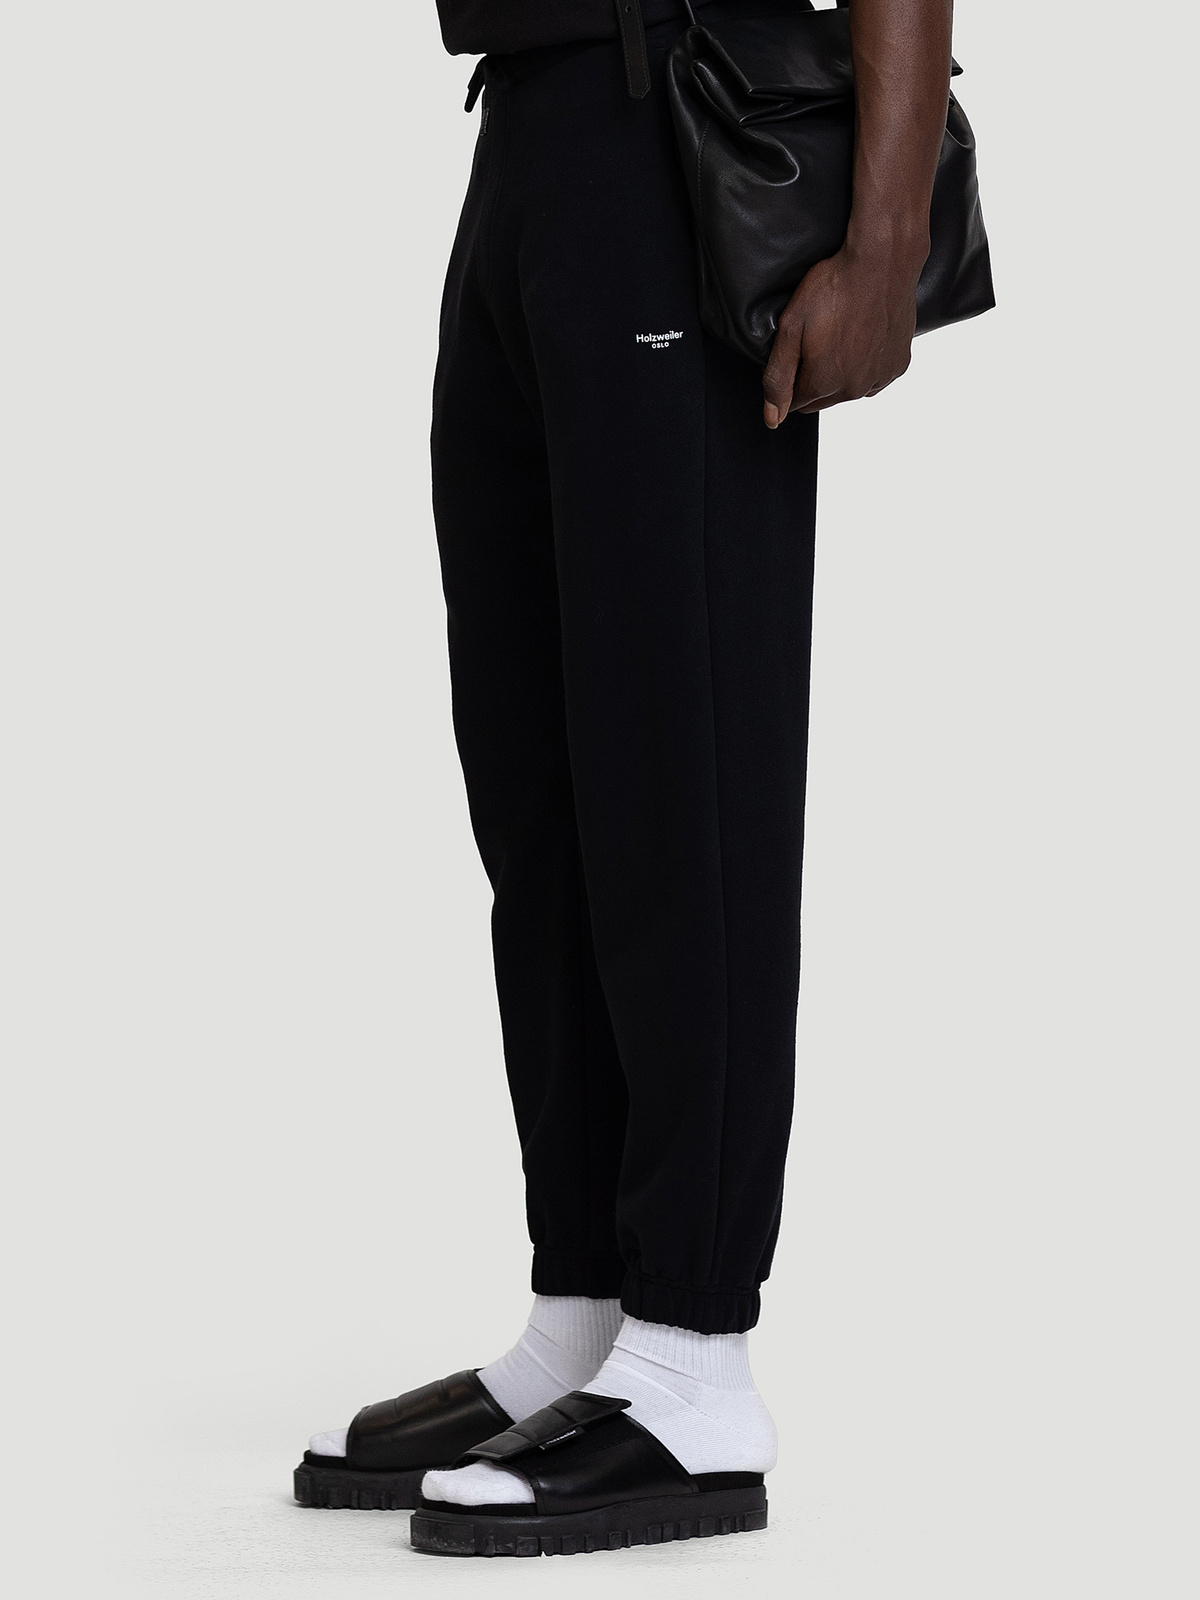 M. Oslo Sweat Trouser Black 1